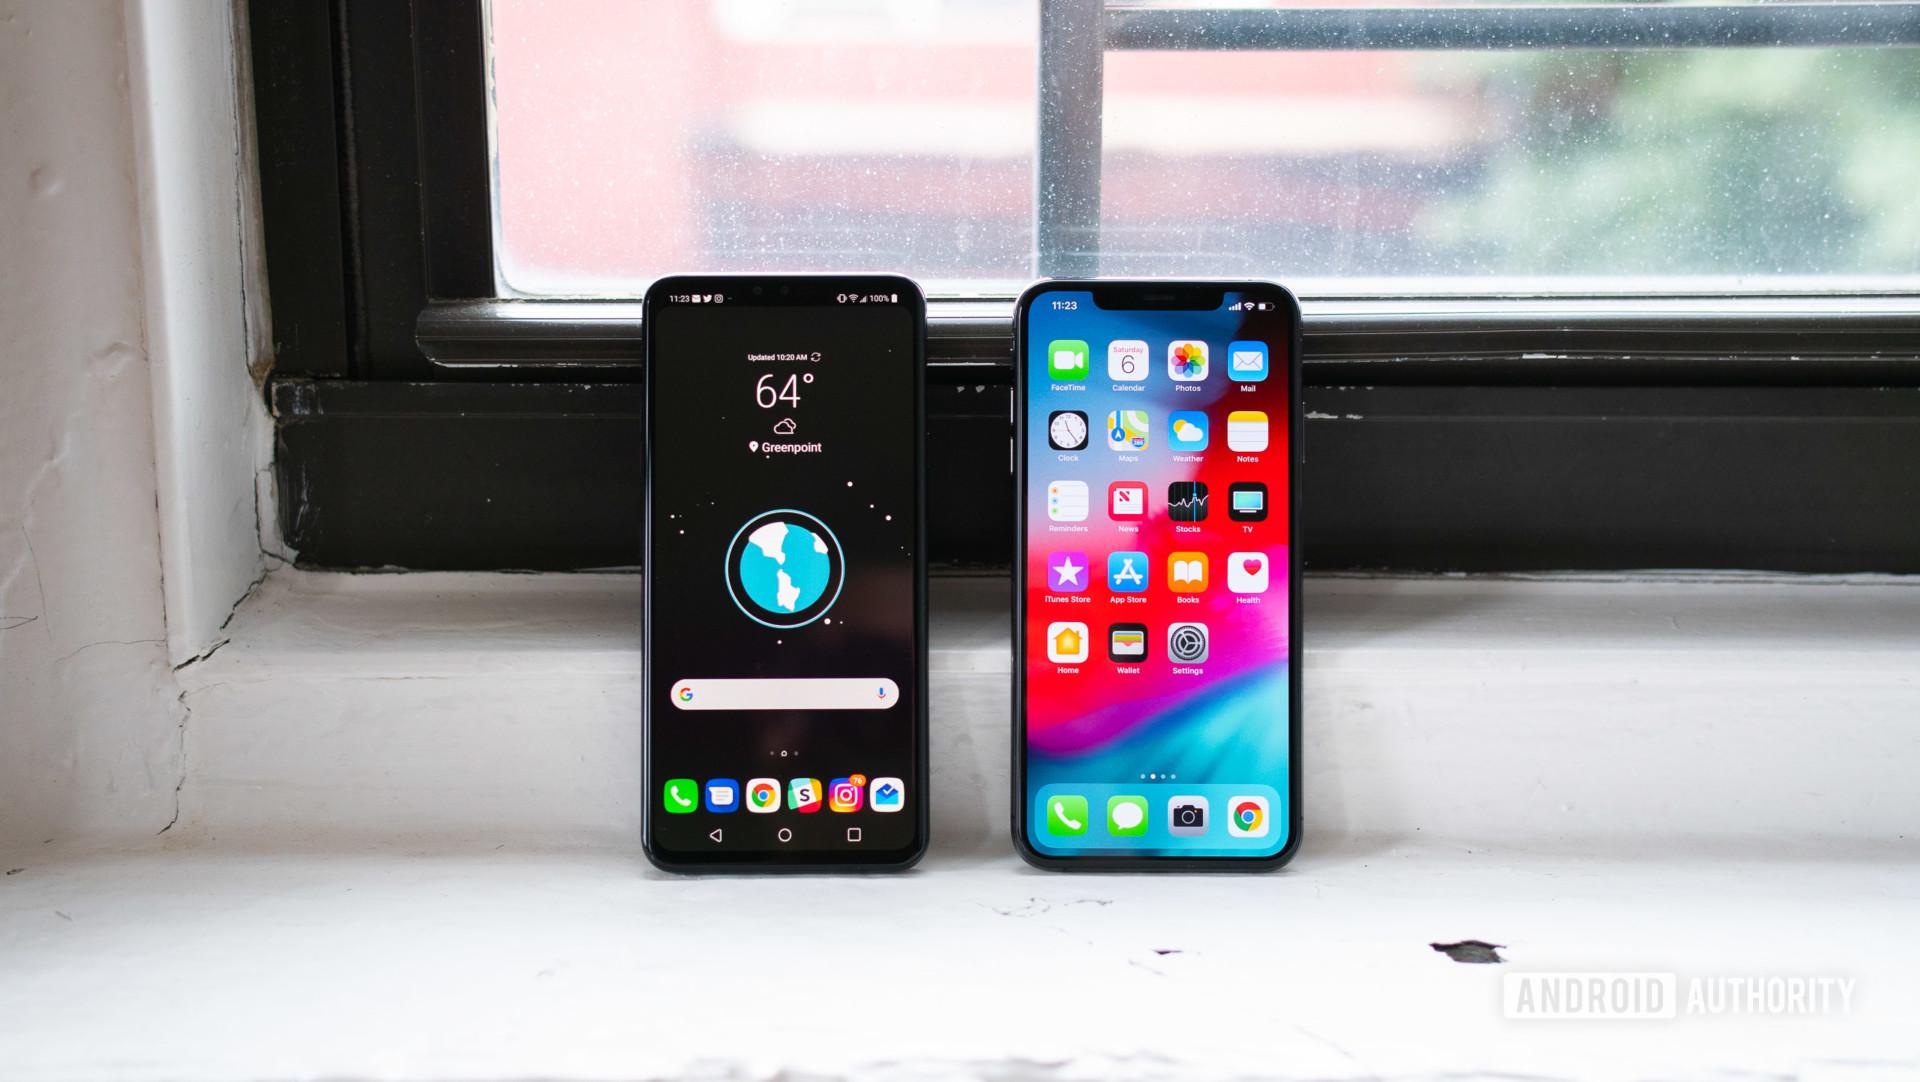 LG V40 vs iPhone XS Max display